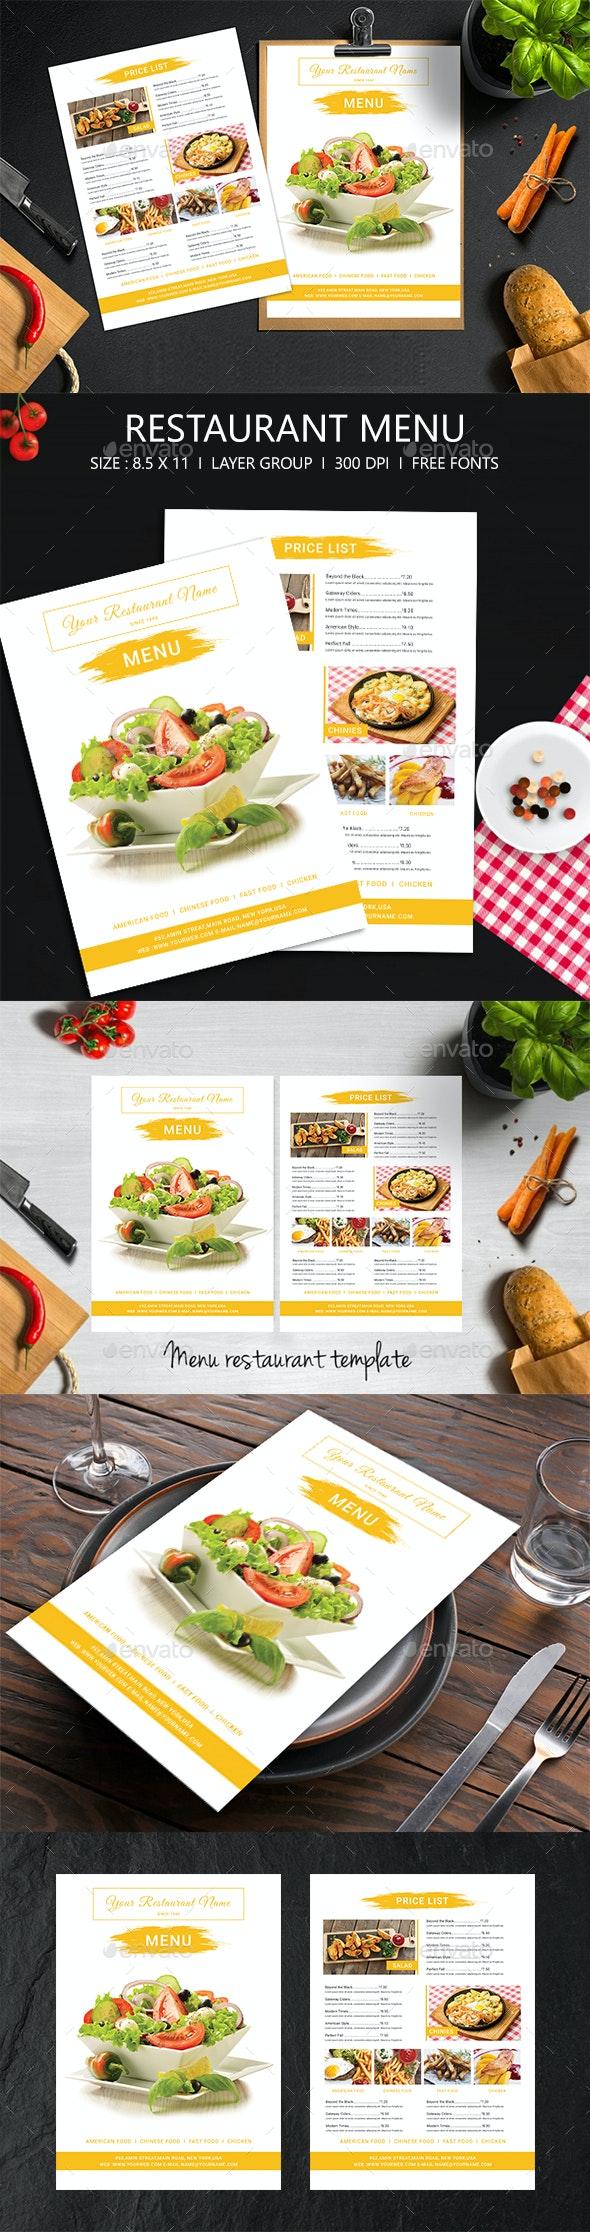 Restaurant Menu - Restaurant Flyers